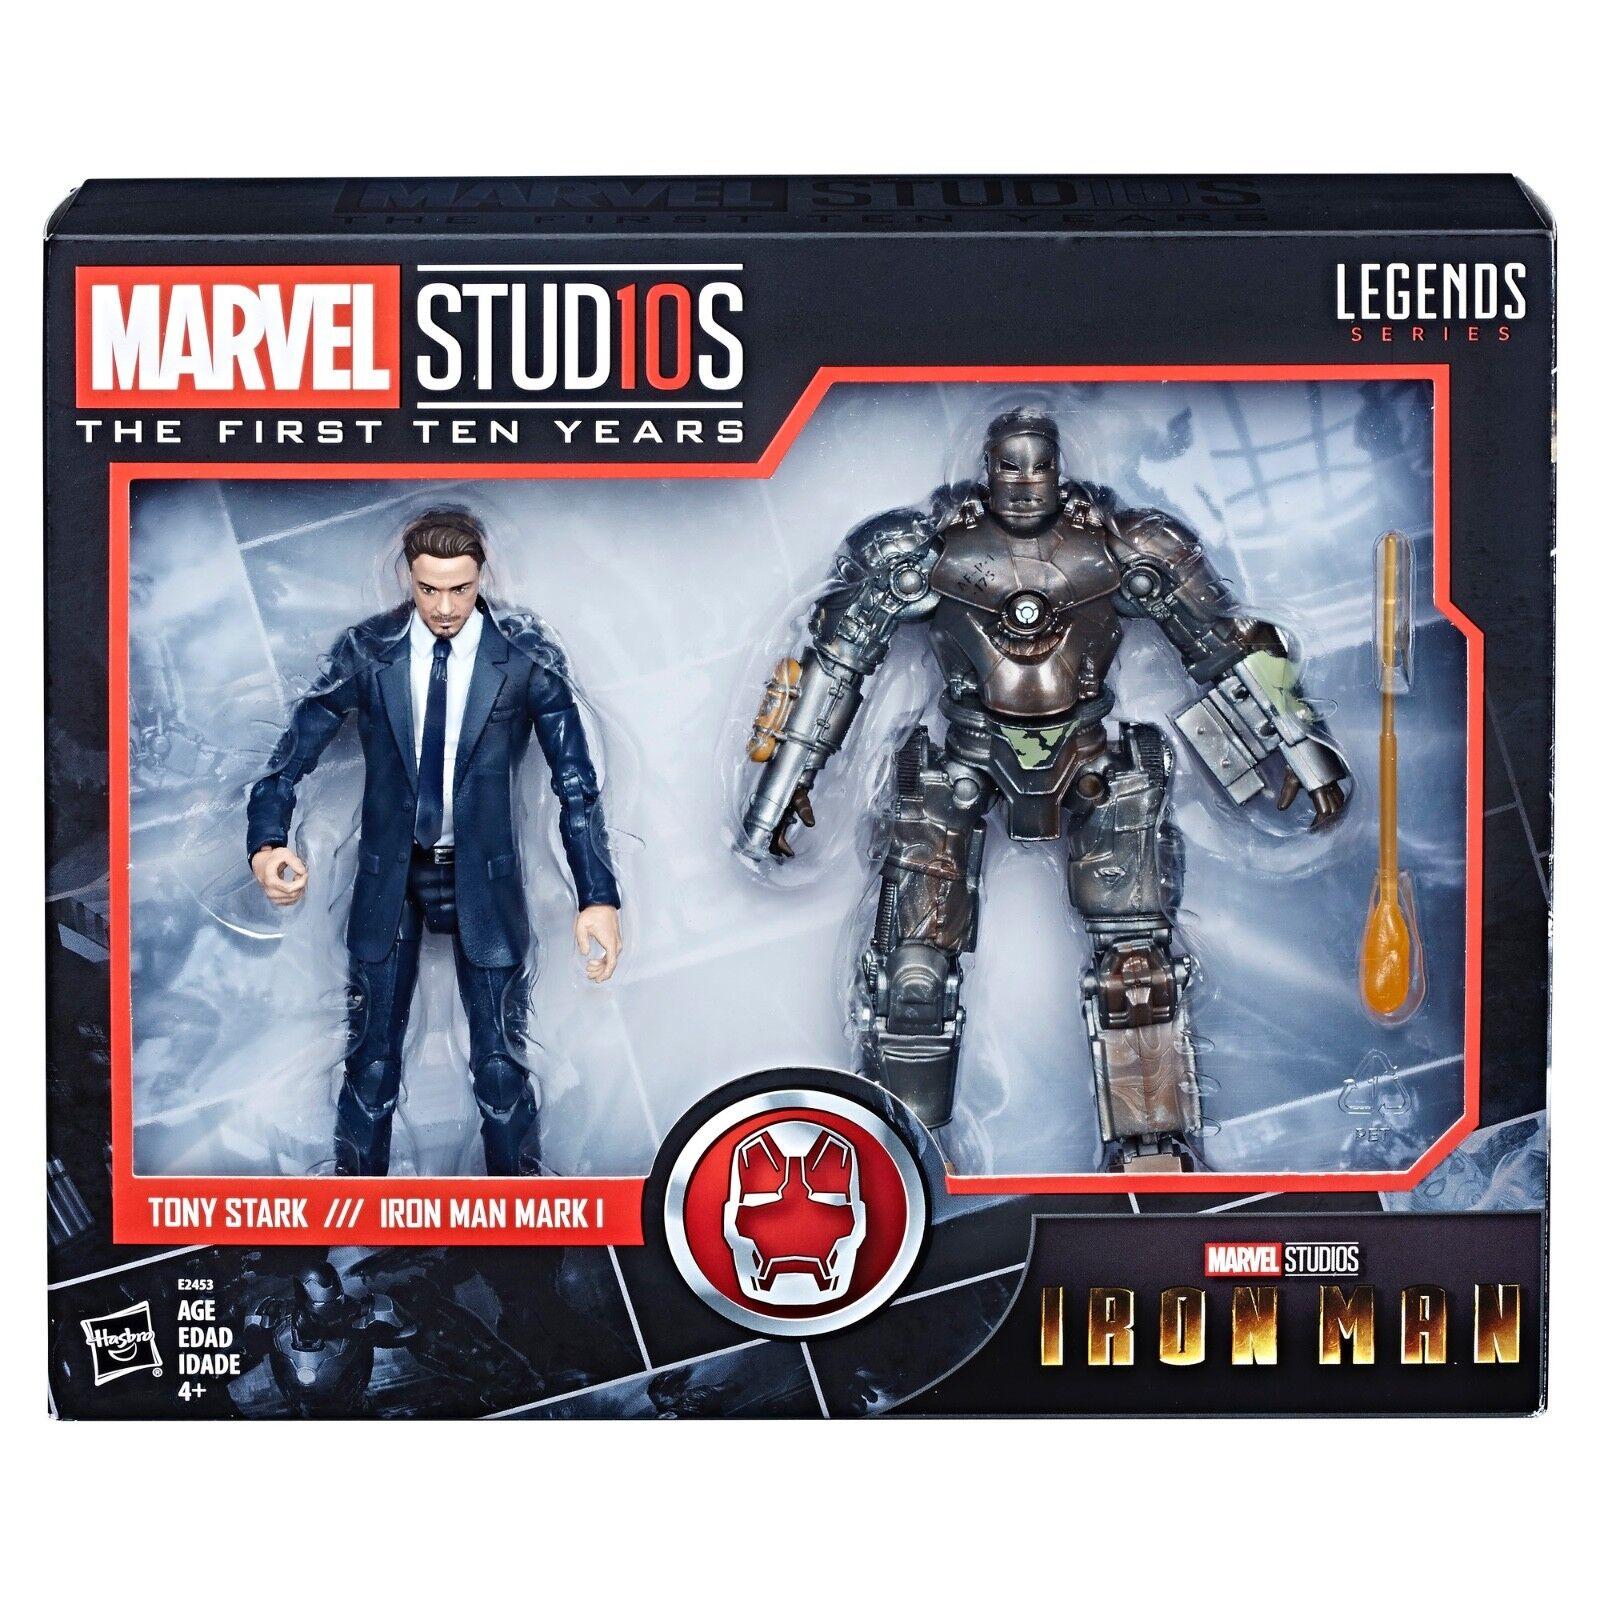 Marvel Legends Studios Tony  Stark & Iron Man Mark I First Ten Years 10th ANV  prix raisonnable